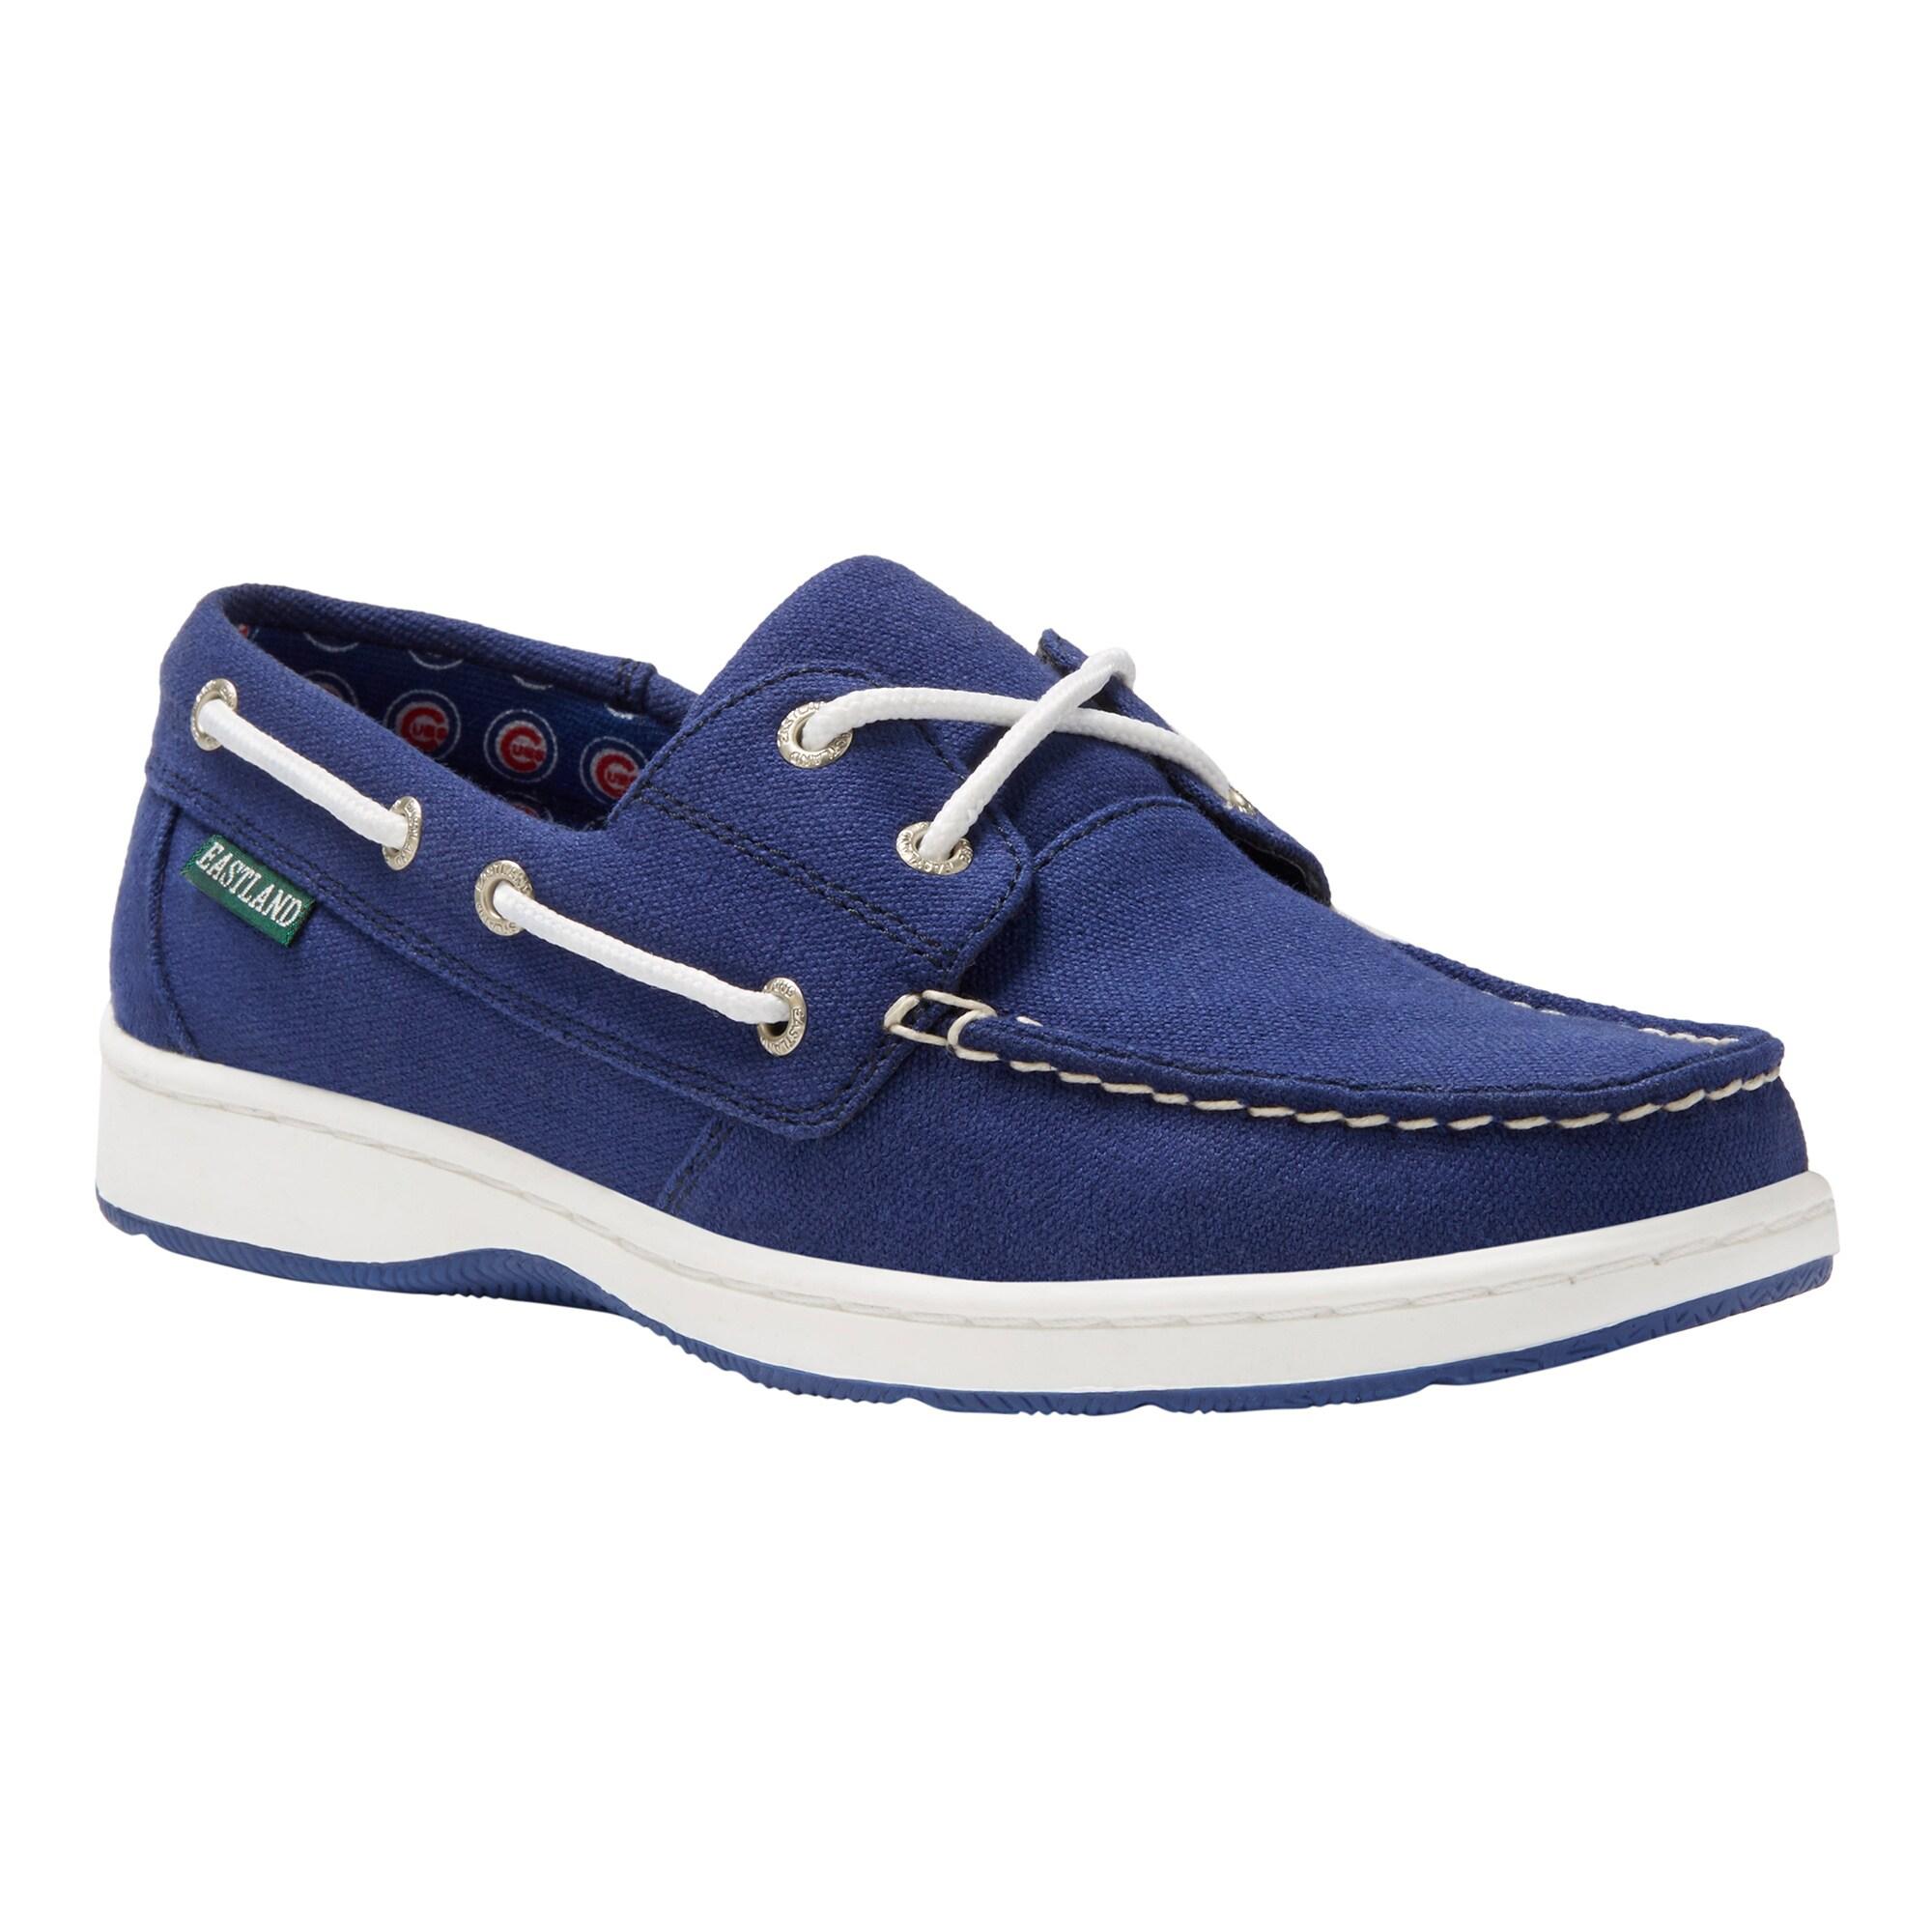 Chicago Cubs Eastland Women's Solstice Boat Shoes - Blue